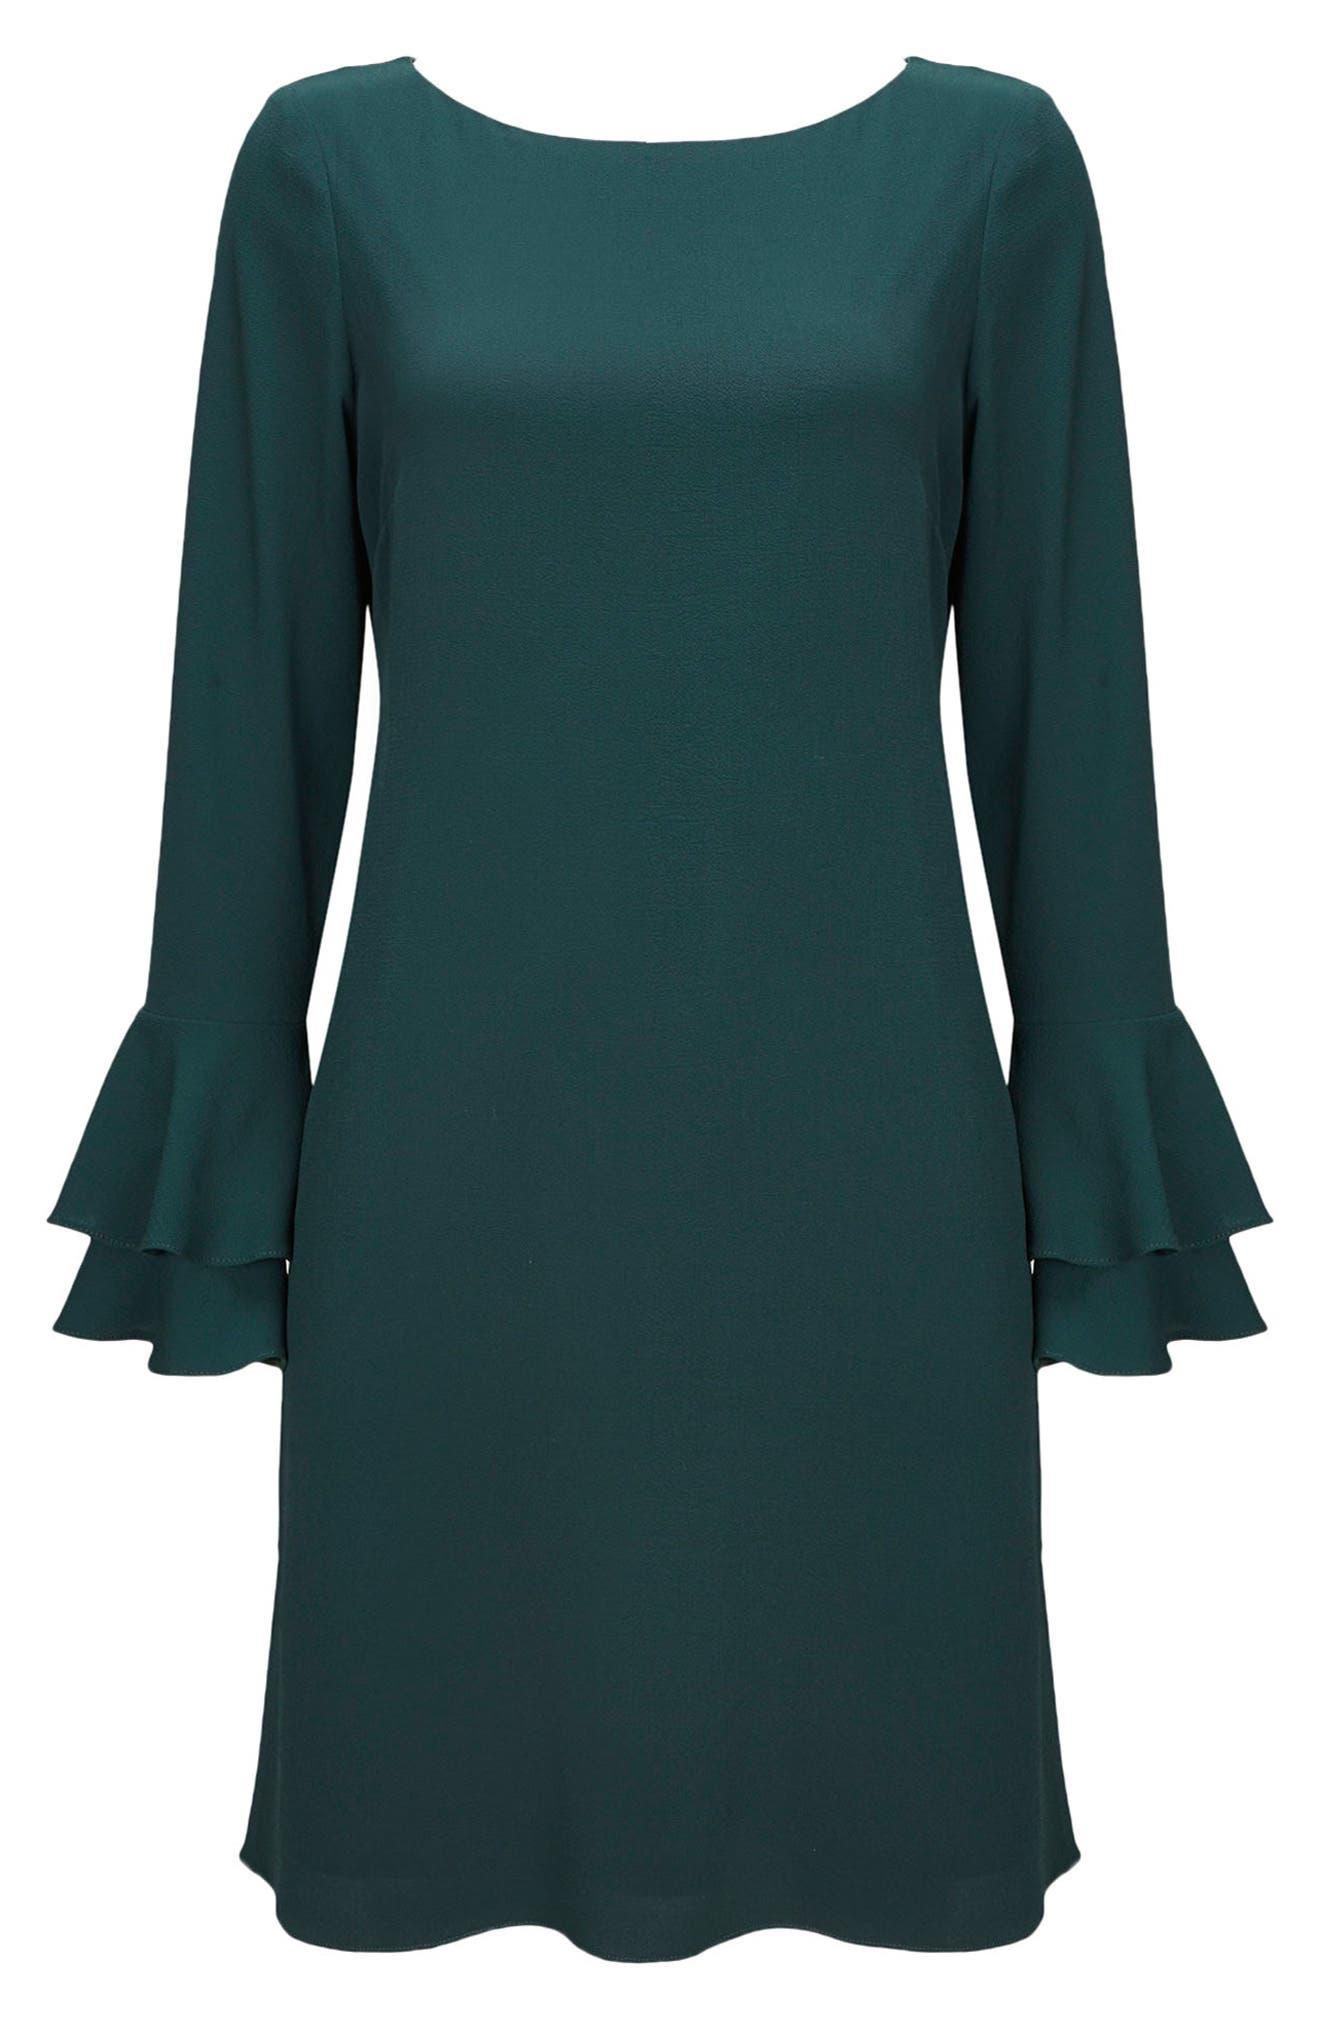 Double Bell Sleeve Shift Dress,                             Alternate thumbnail 4, color,                             300